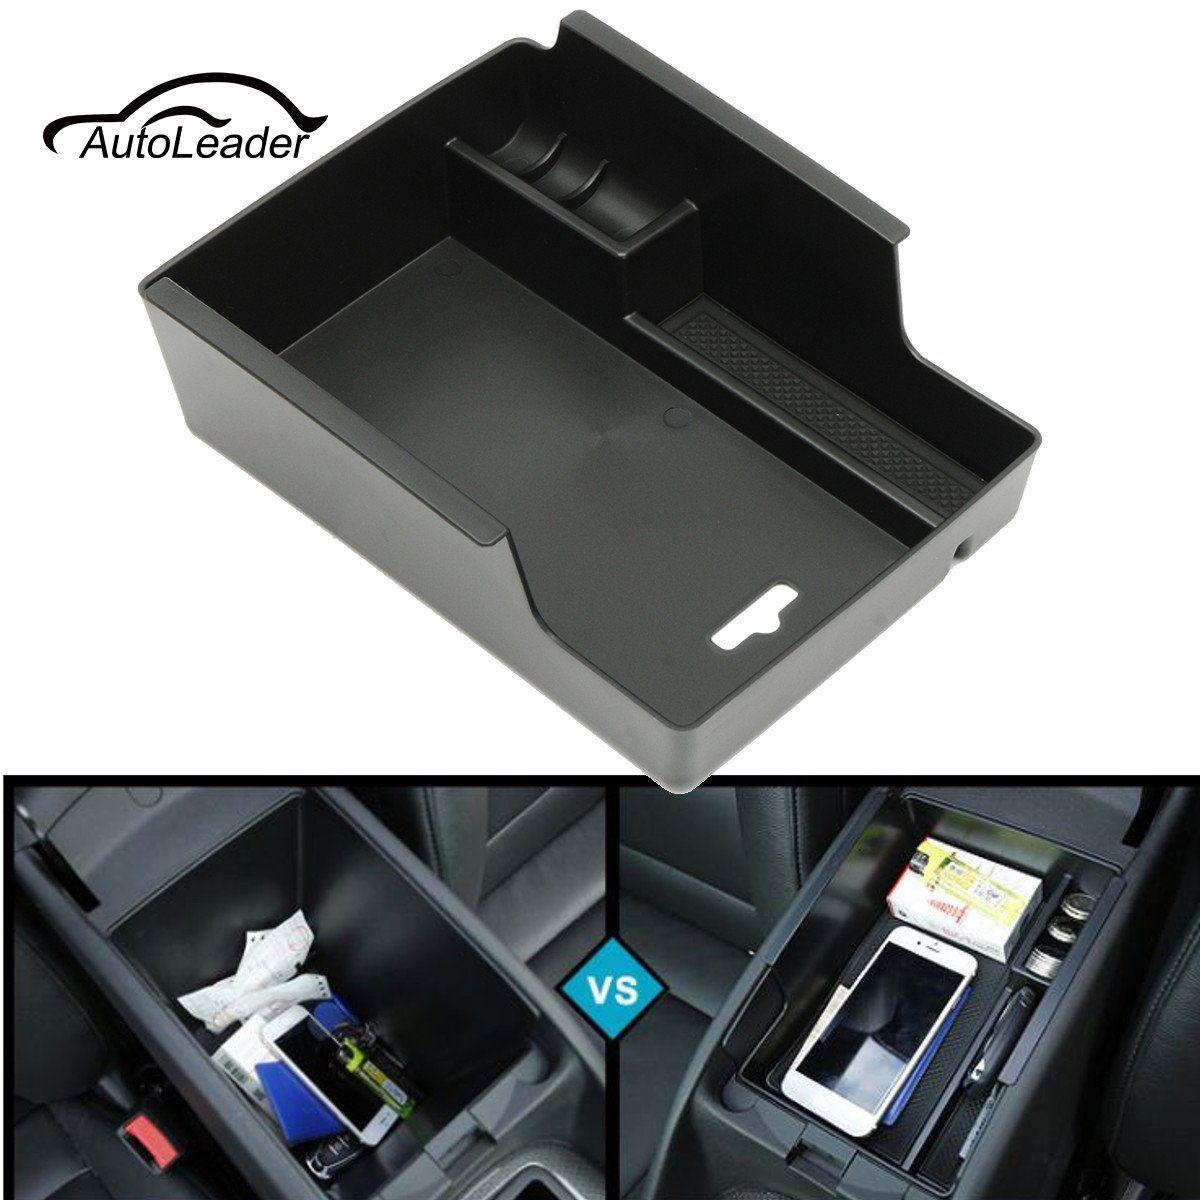 New Center Armrest Handle Upgrade Storage Box For Chevrolet Malibu 2016 2017